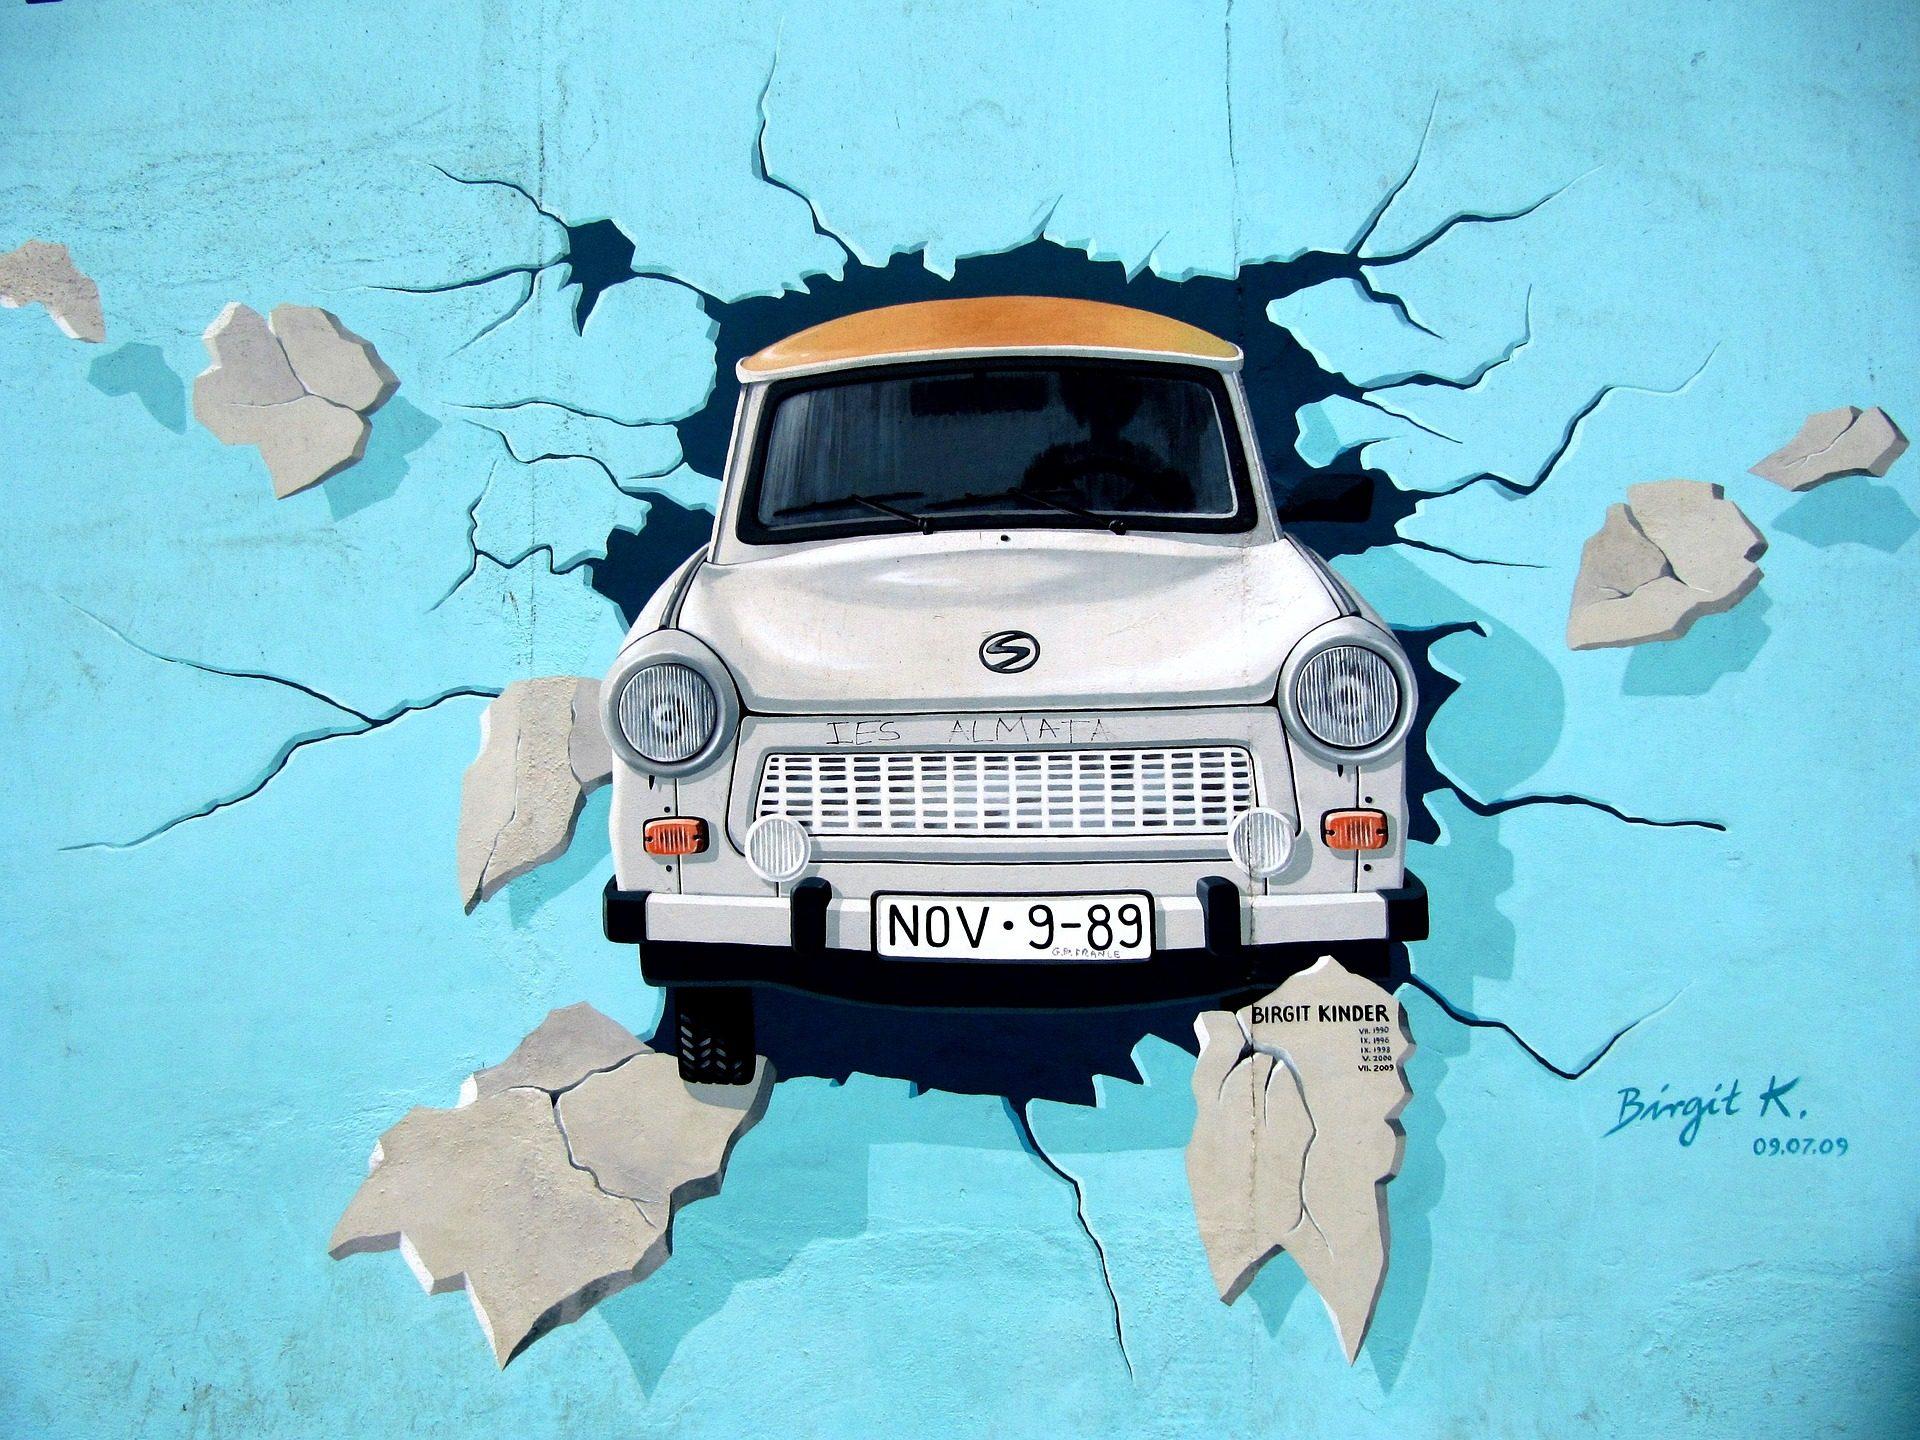 Graffiti, muro, Berlin, Auto, paWand Wallpaper HD - Prof.-falken.com